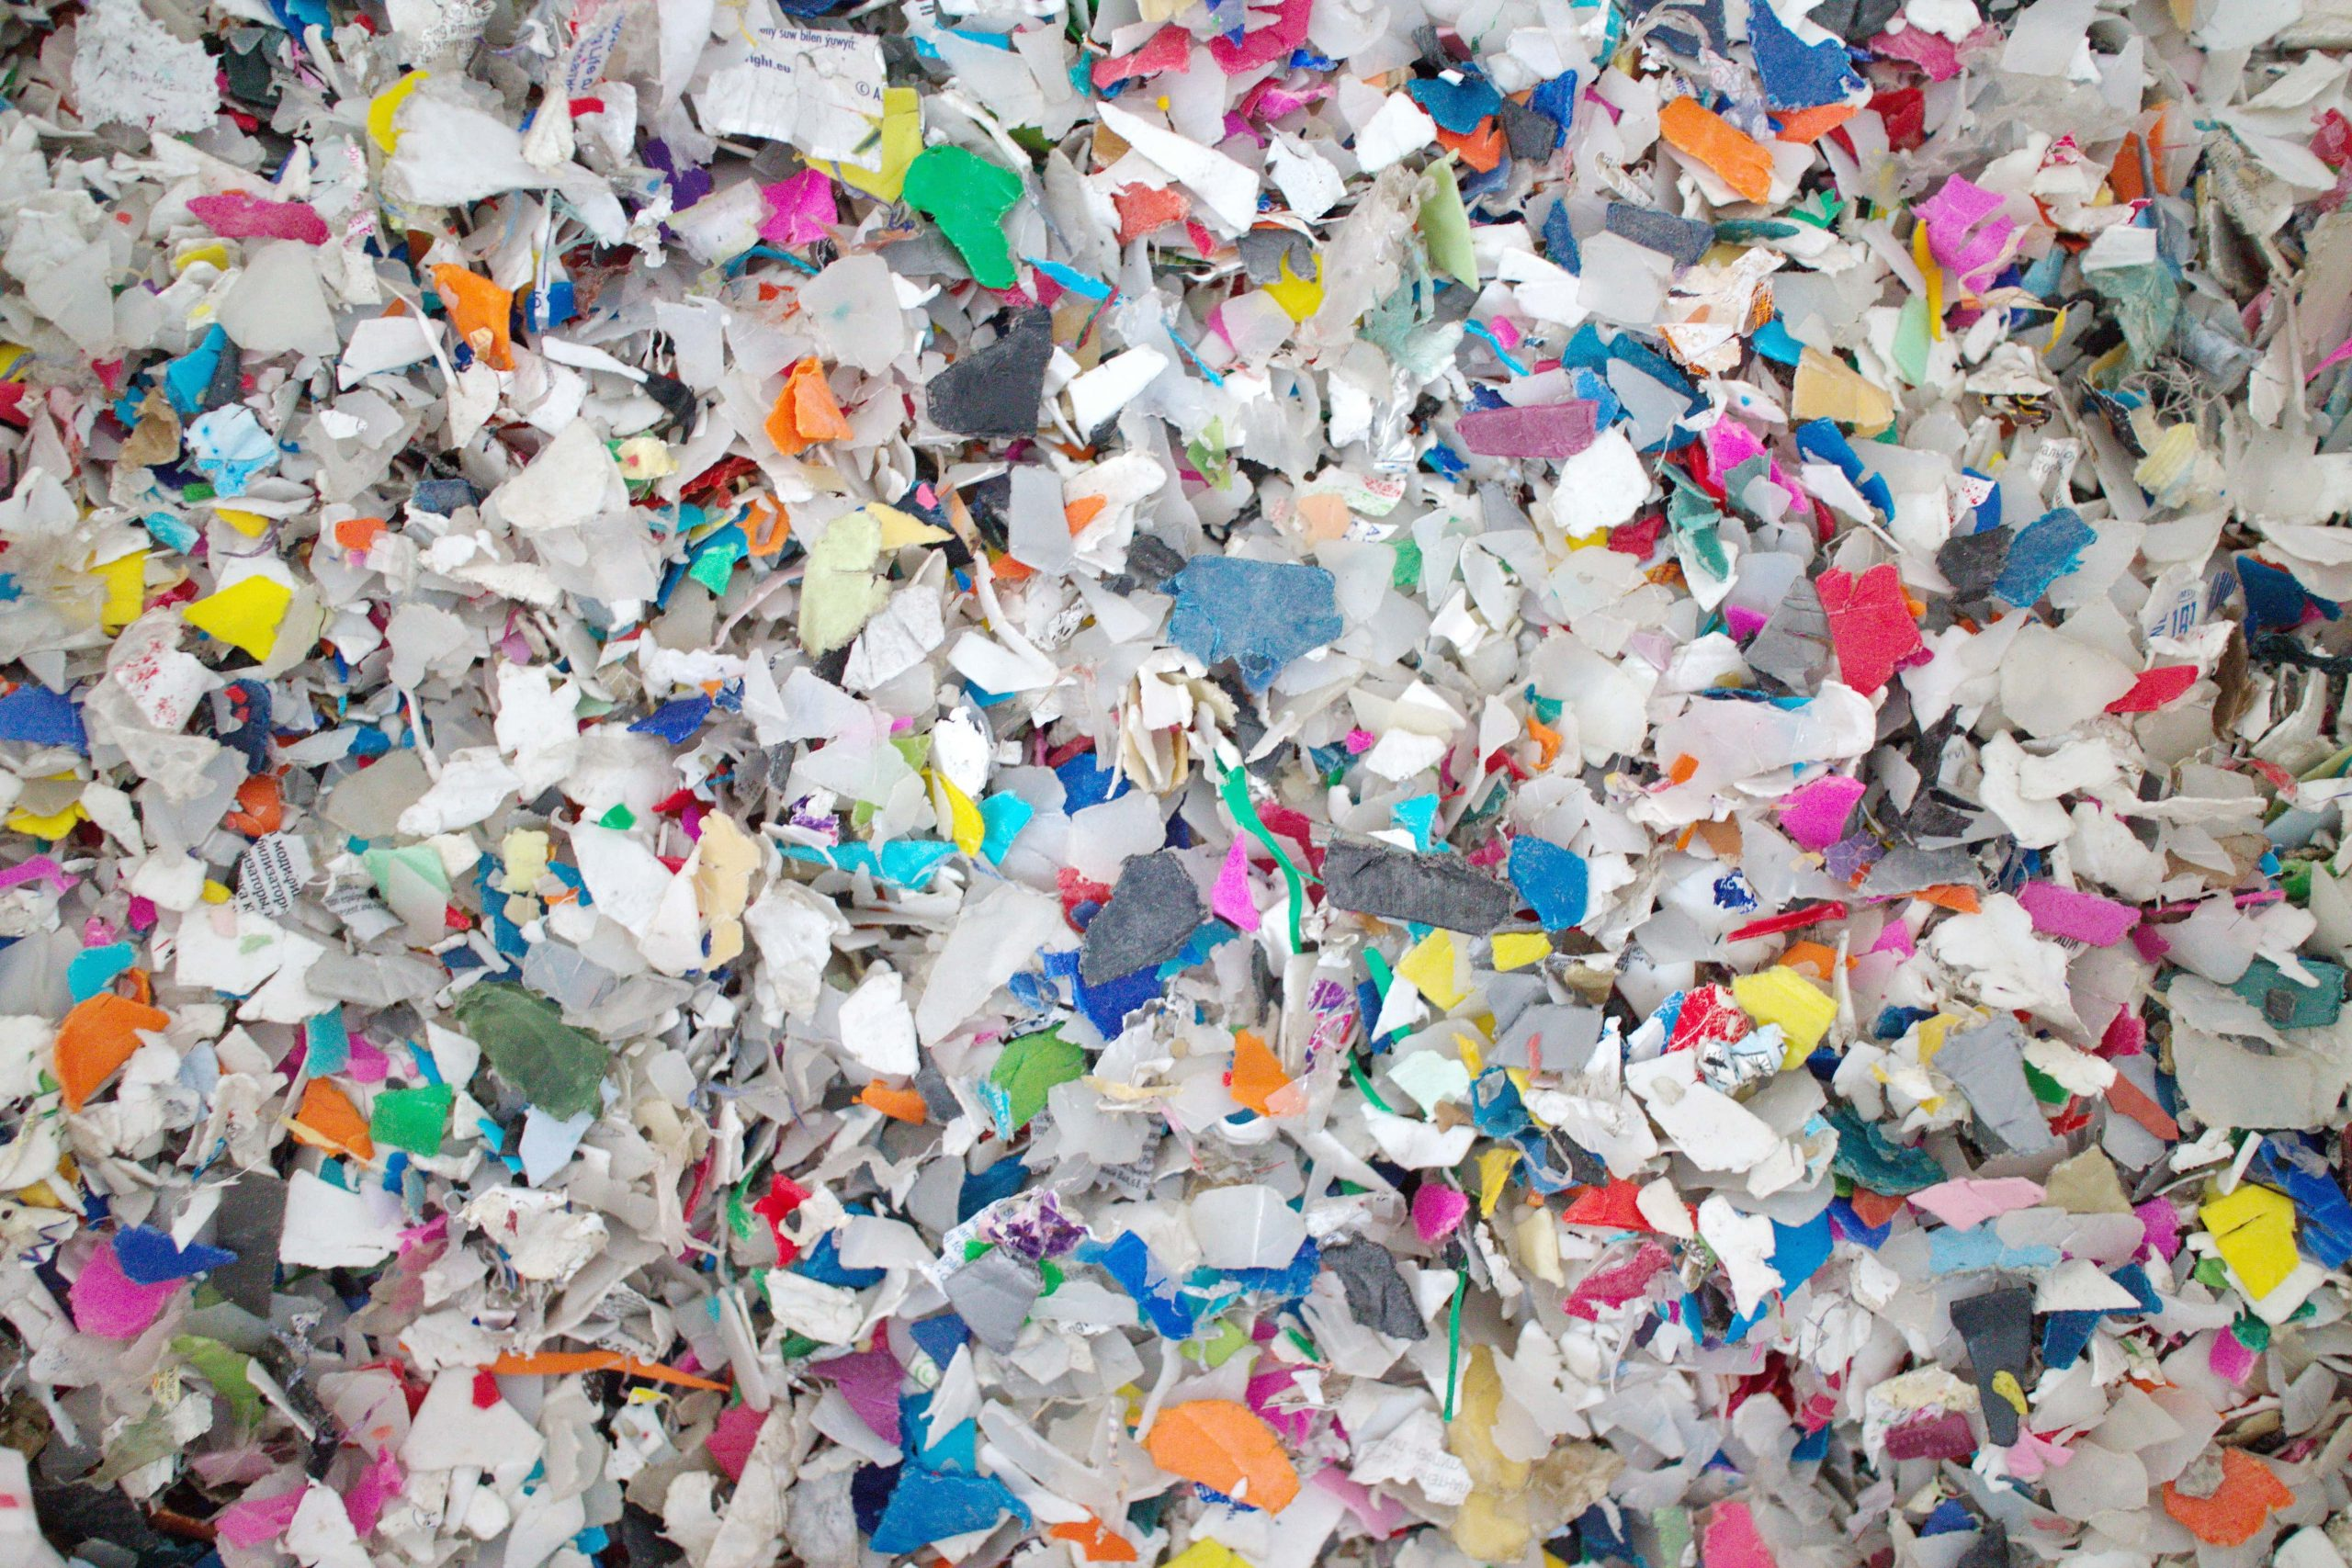 Plastiques broyés